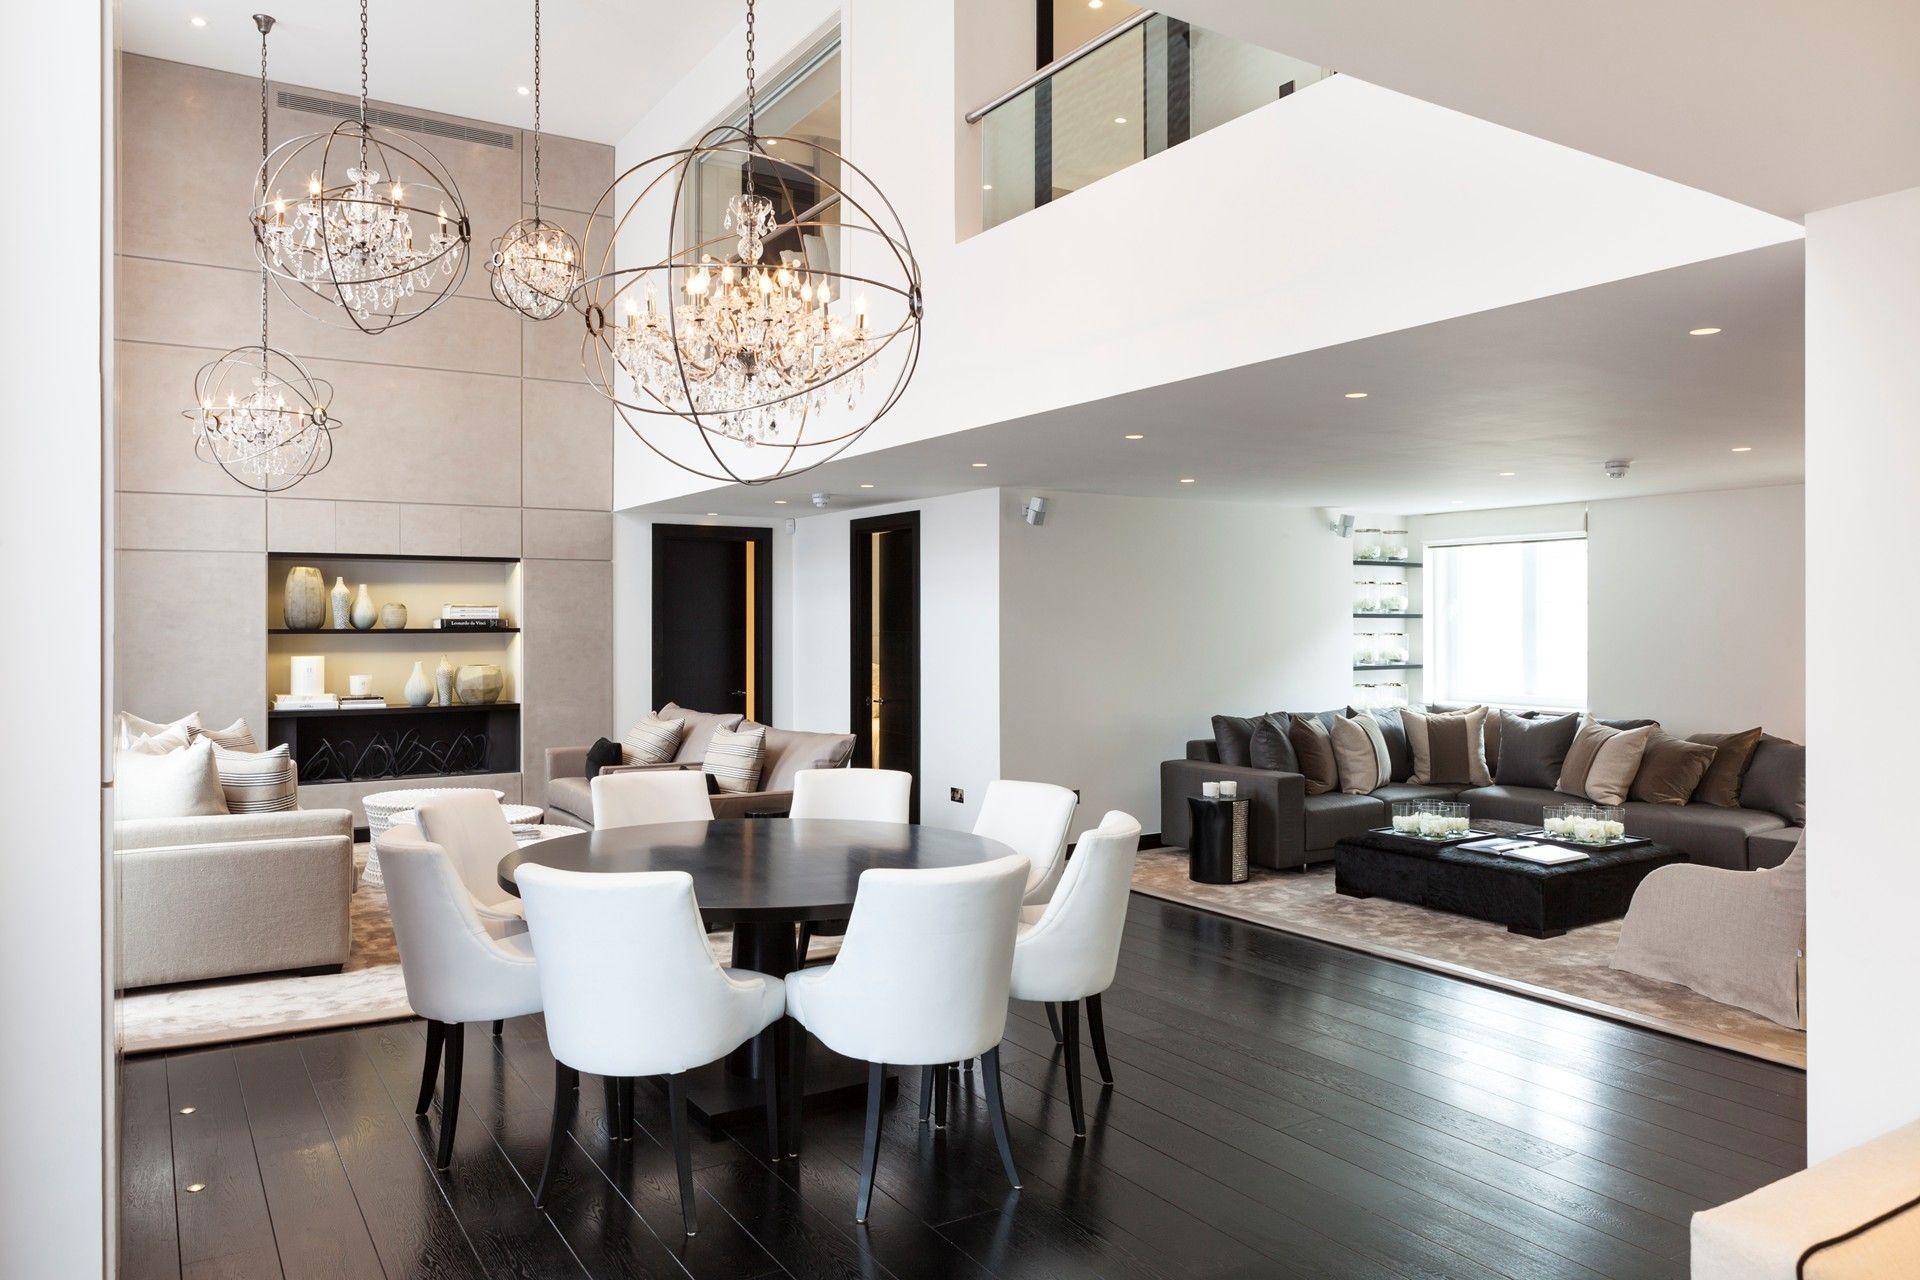 kitchen table chandelier Elegant Chandeliers Dining Table Living Space Open Plan Henrietta Street Apartment